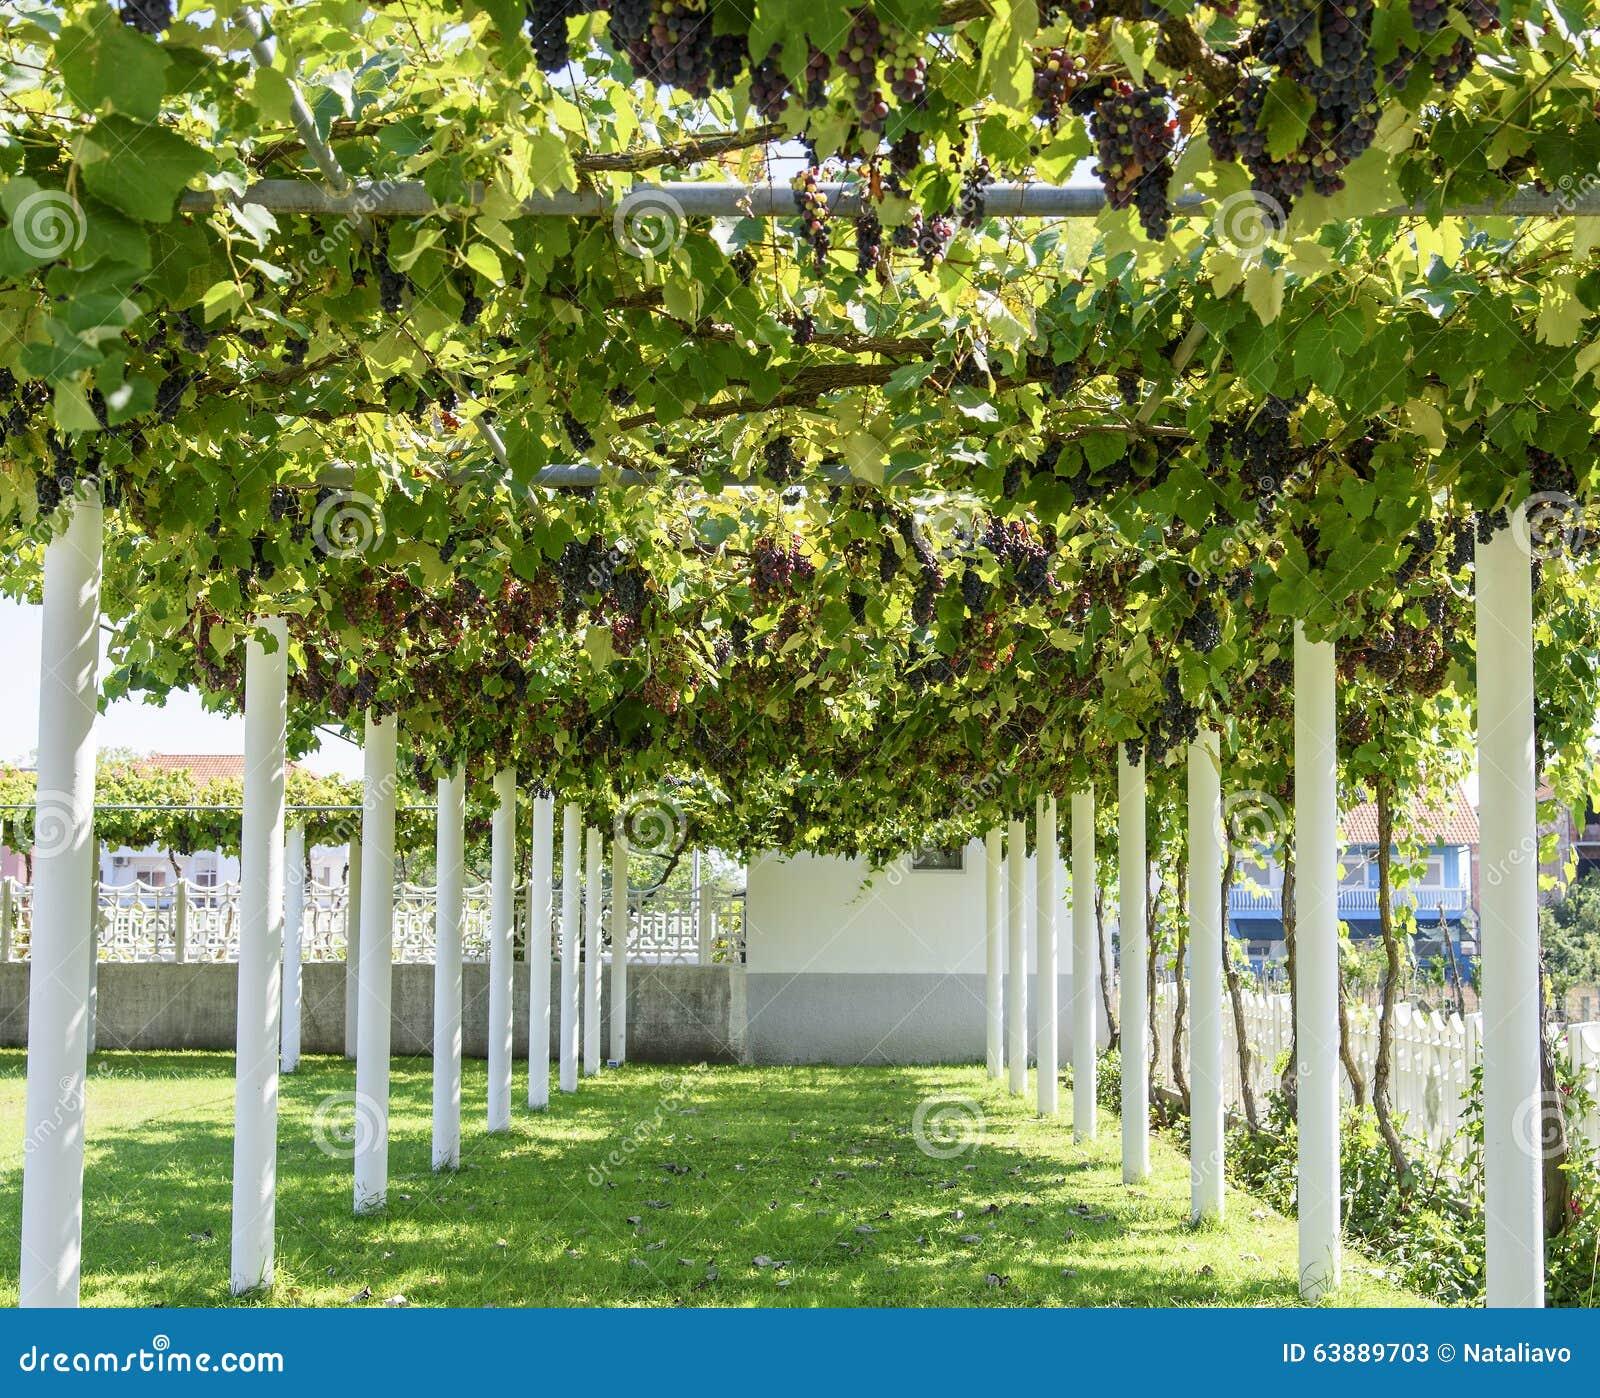 all e avec la pergola couverte de vigne de raisin image stock image du ferme fond 63889703. Black Bedroom Furniture Sets. Home Design Ideas